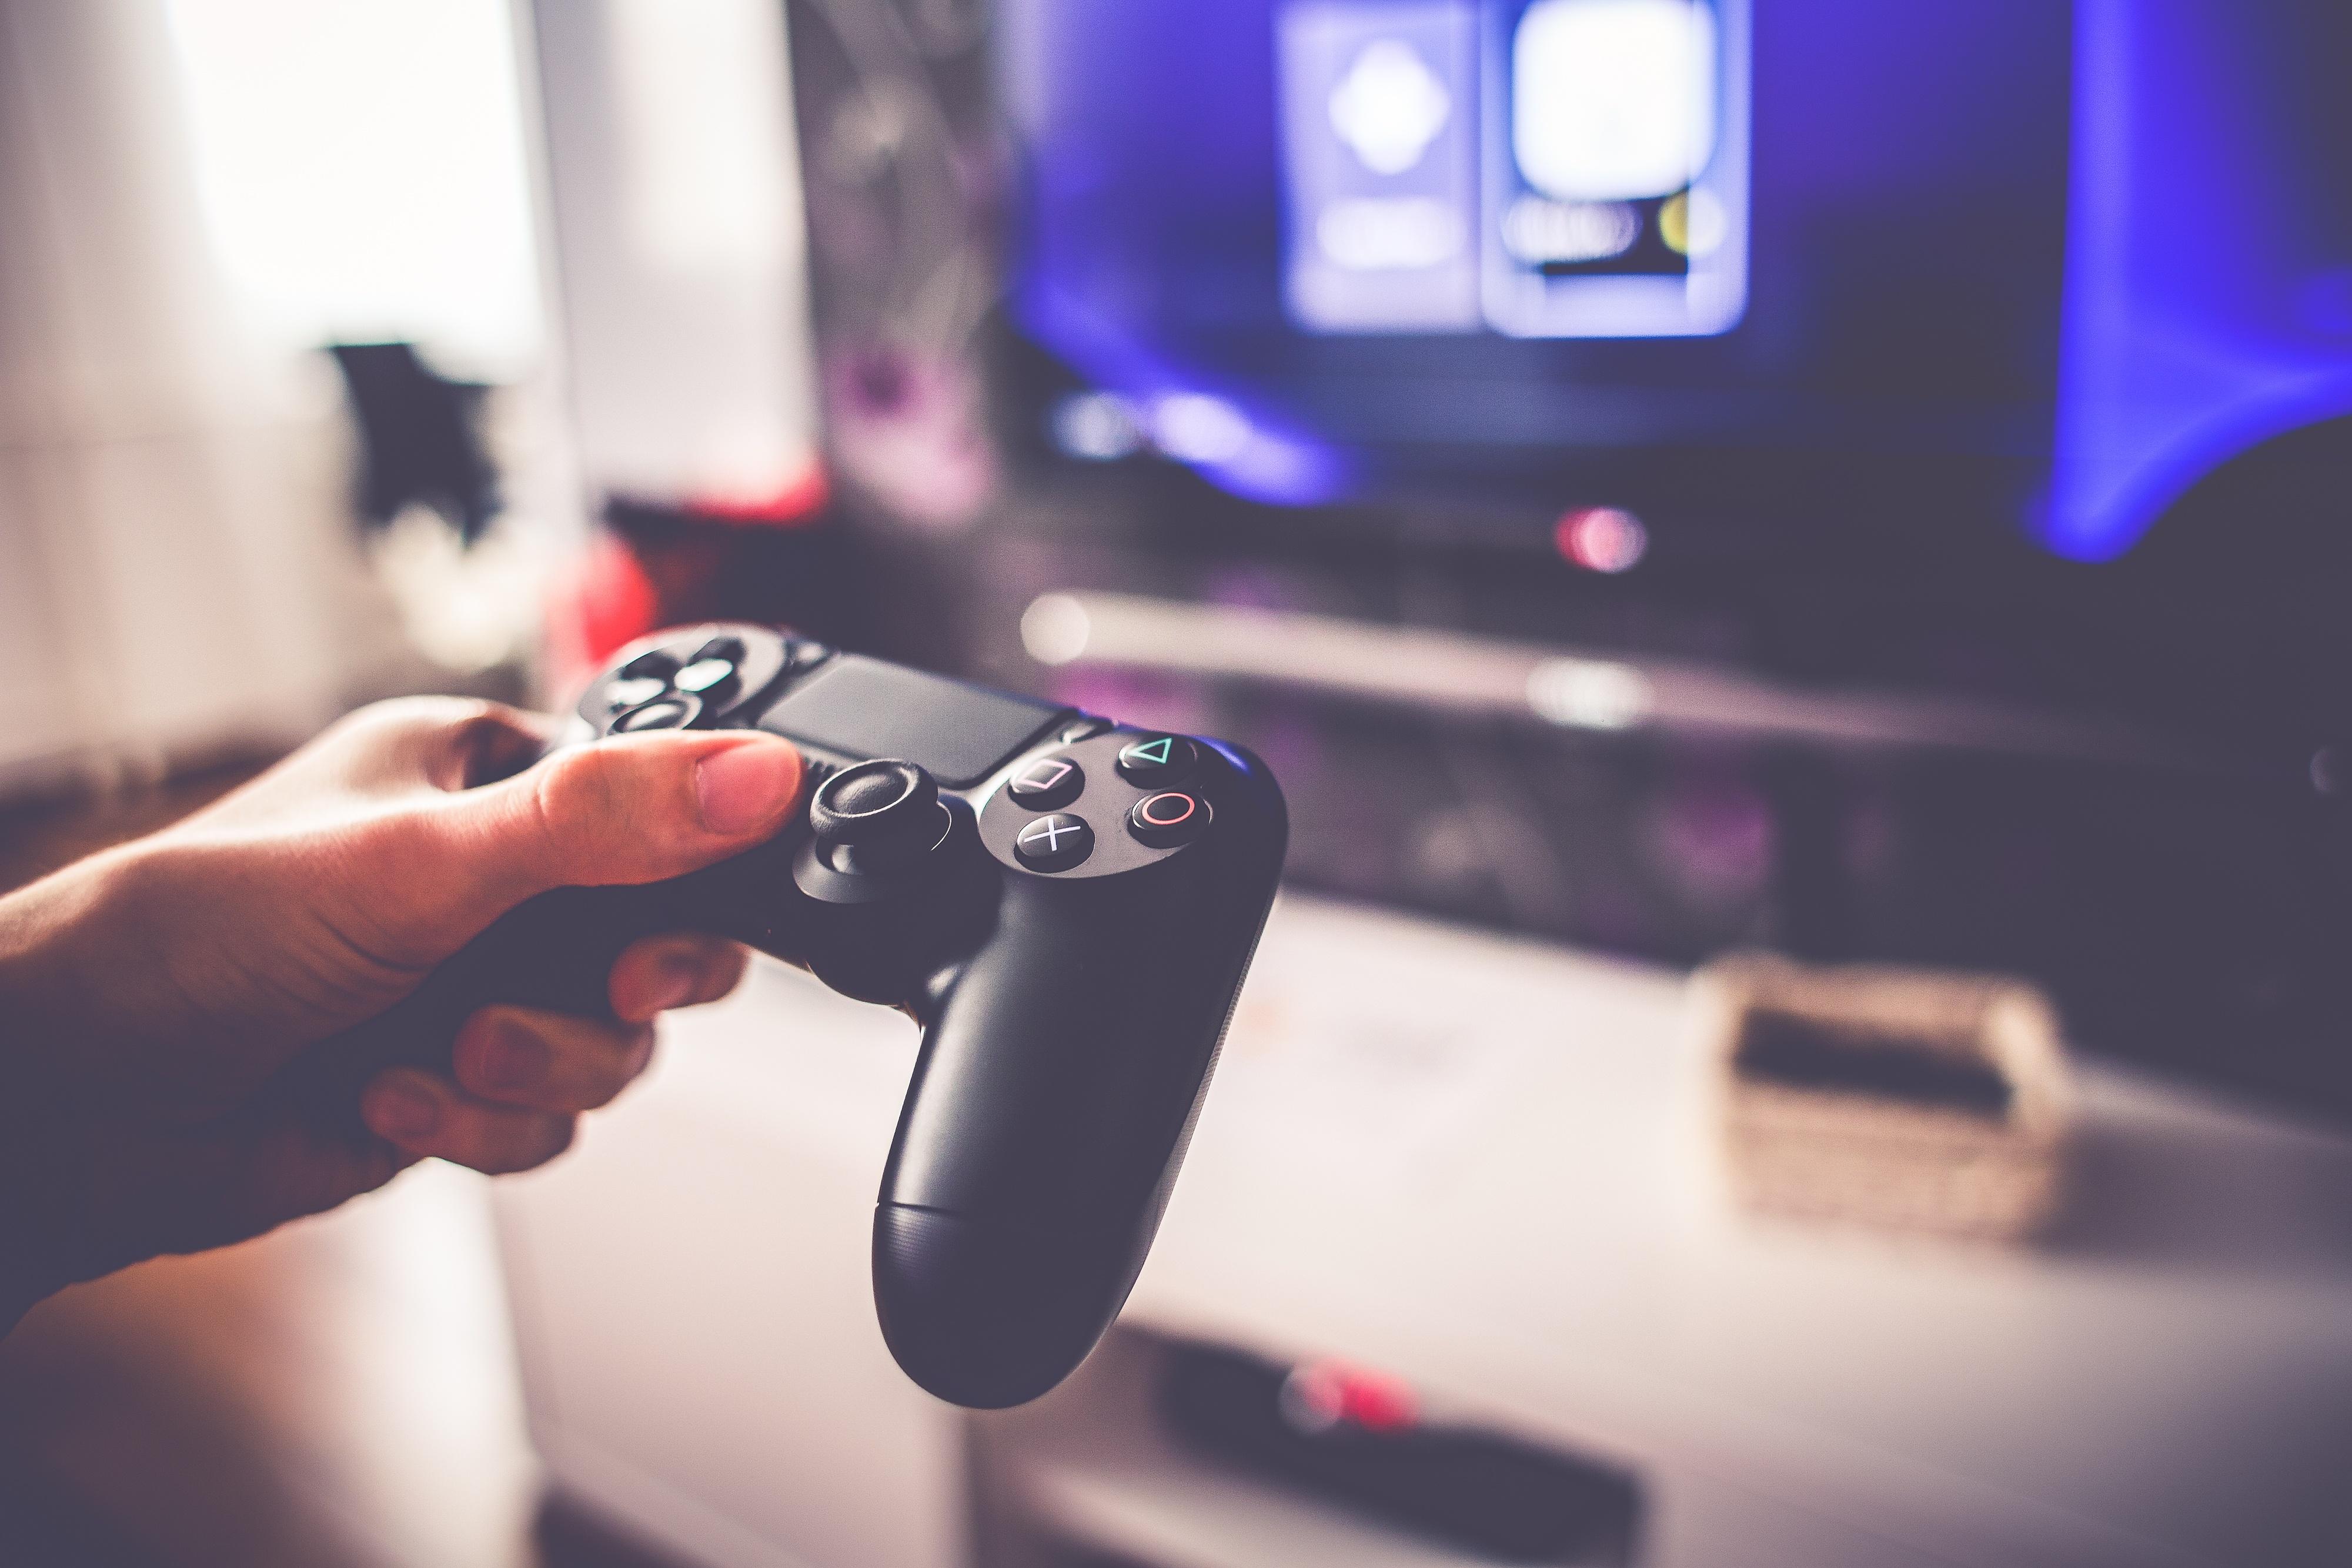 playing-games-on-playstation-4-picjumbo-com.jpg